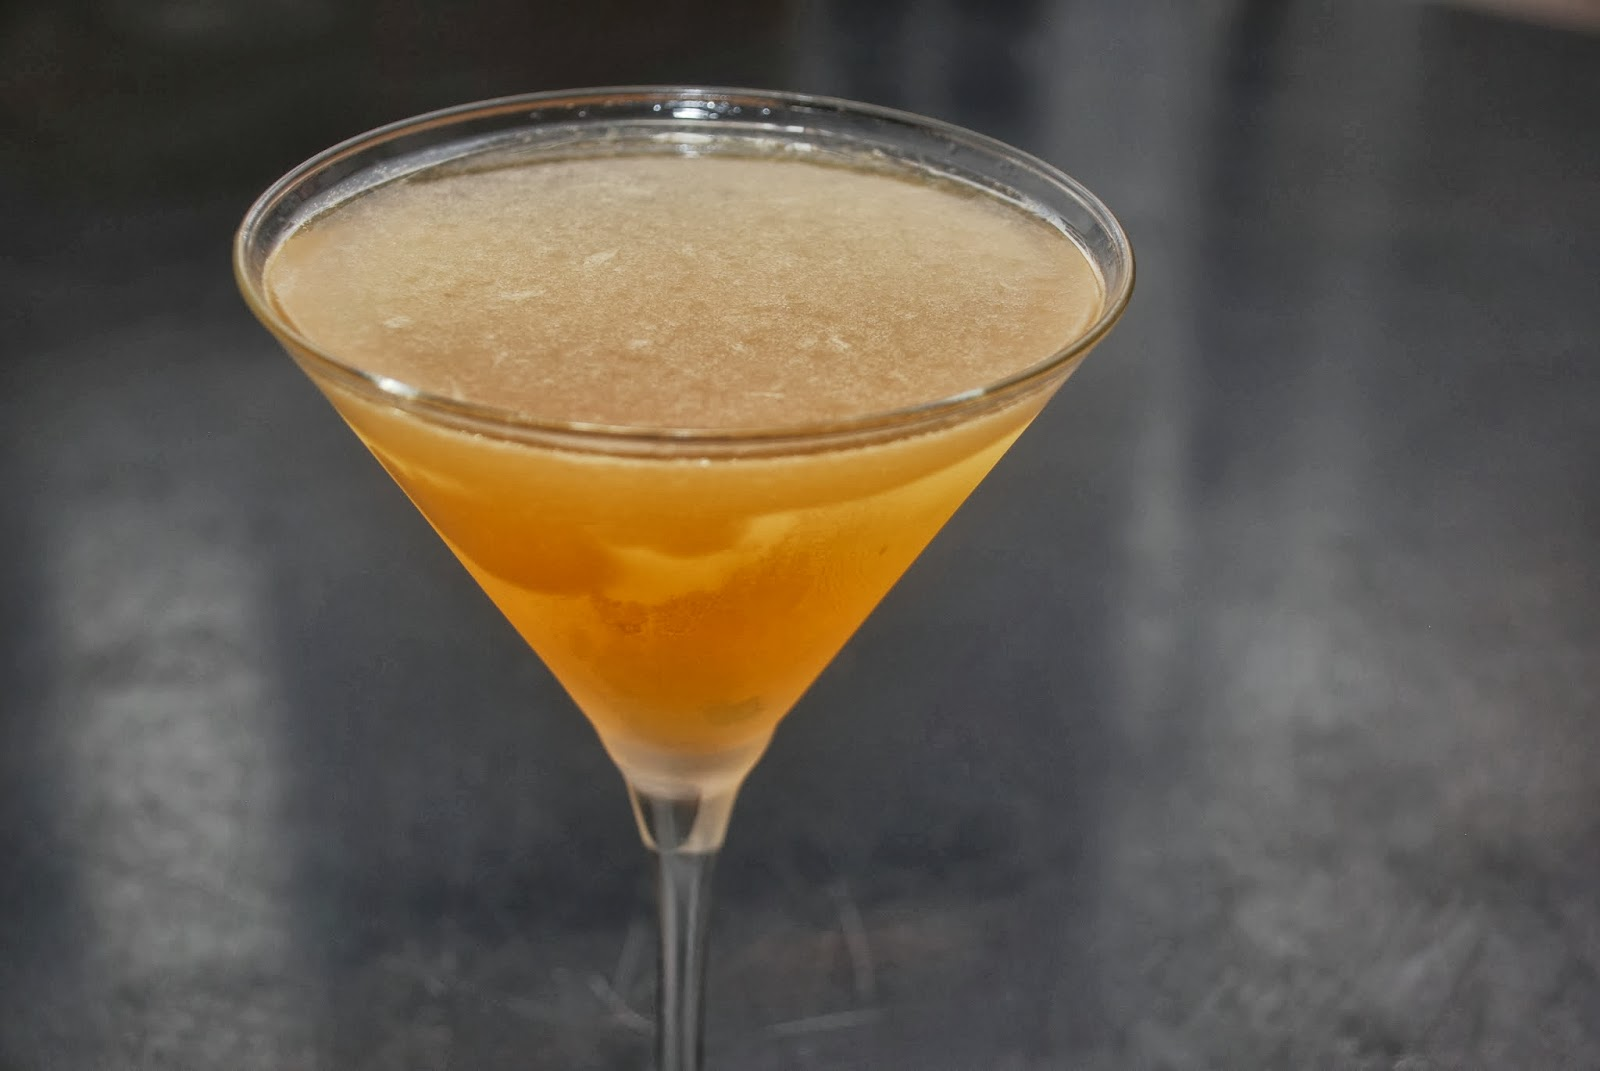 Tomatoes on the Vine: The Original Daiquiri Cocktail